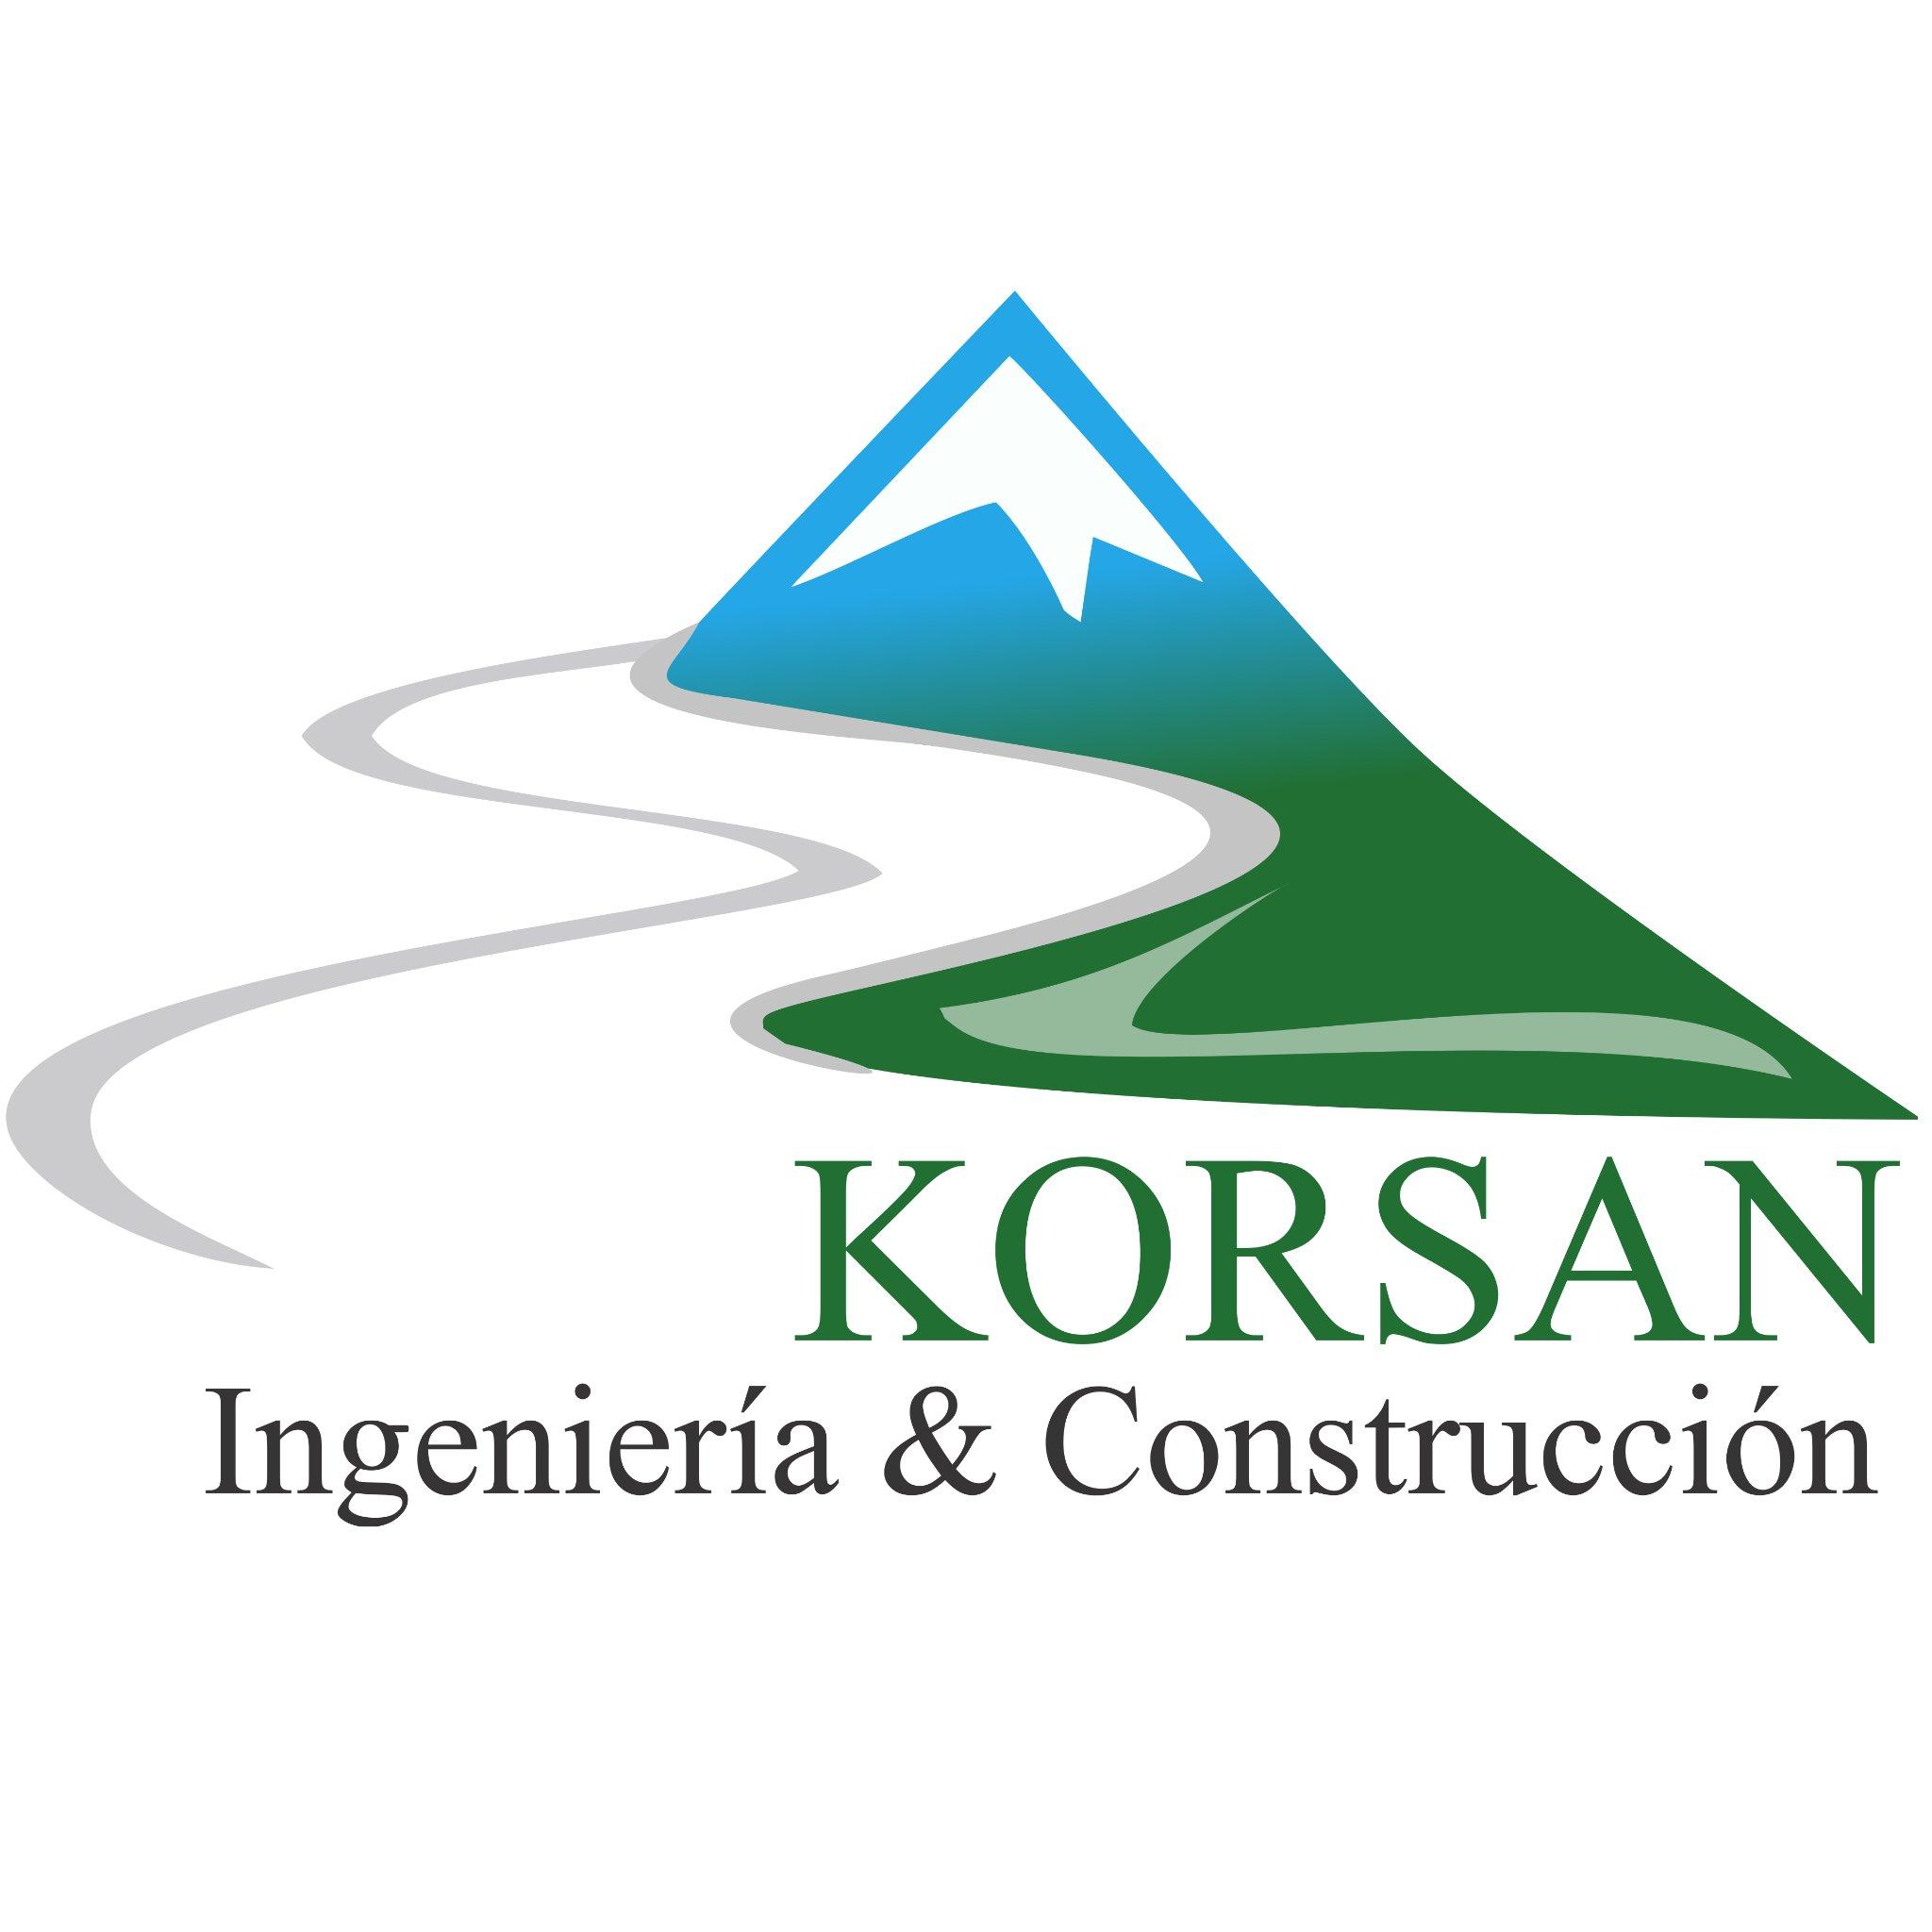 Constructora korsan korsan2016 twitter for Constructora